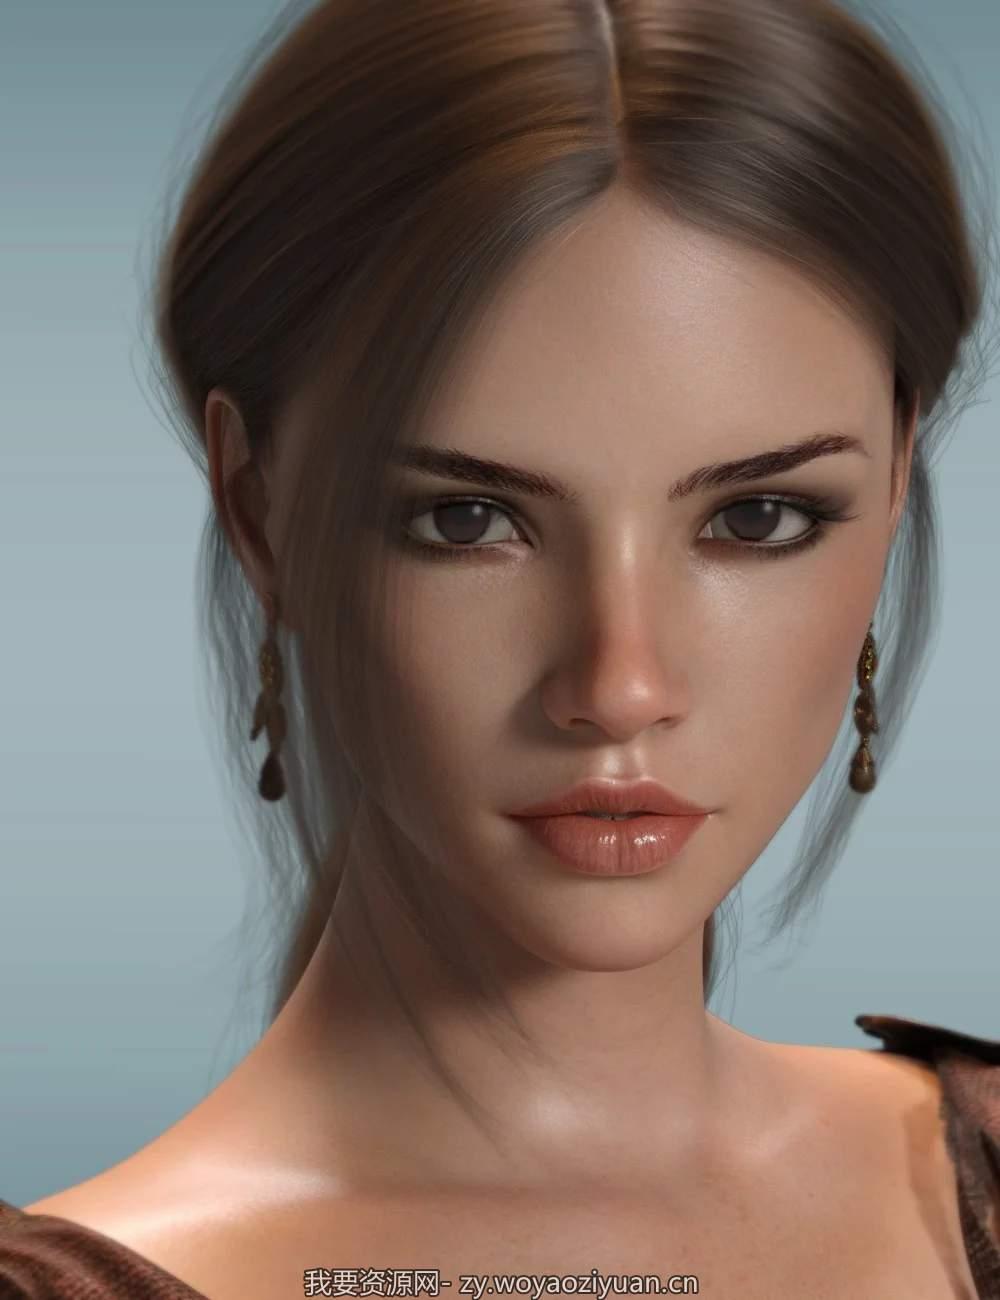 P3D Aria HD for Genesis 8 Female